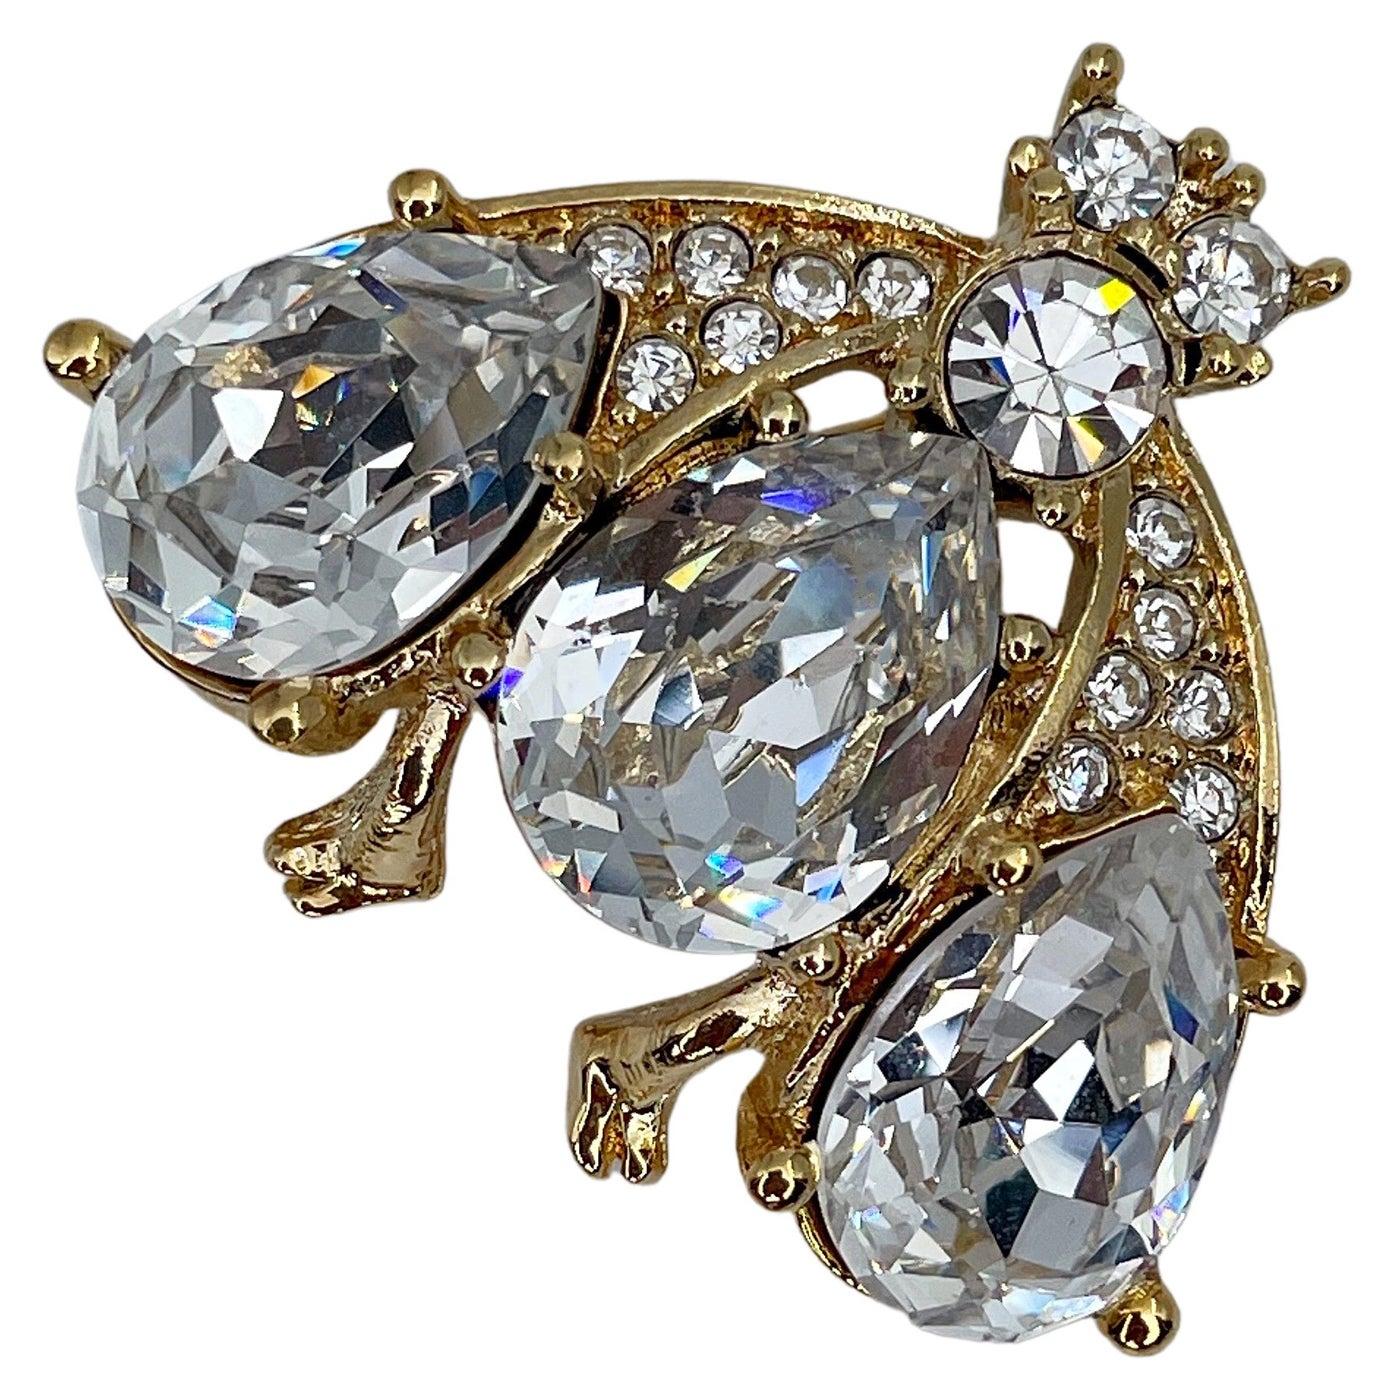 Vintage Christian Dior Gold Tone Crystal Bee Brooch